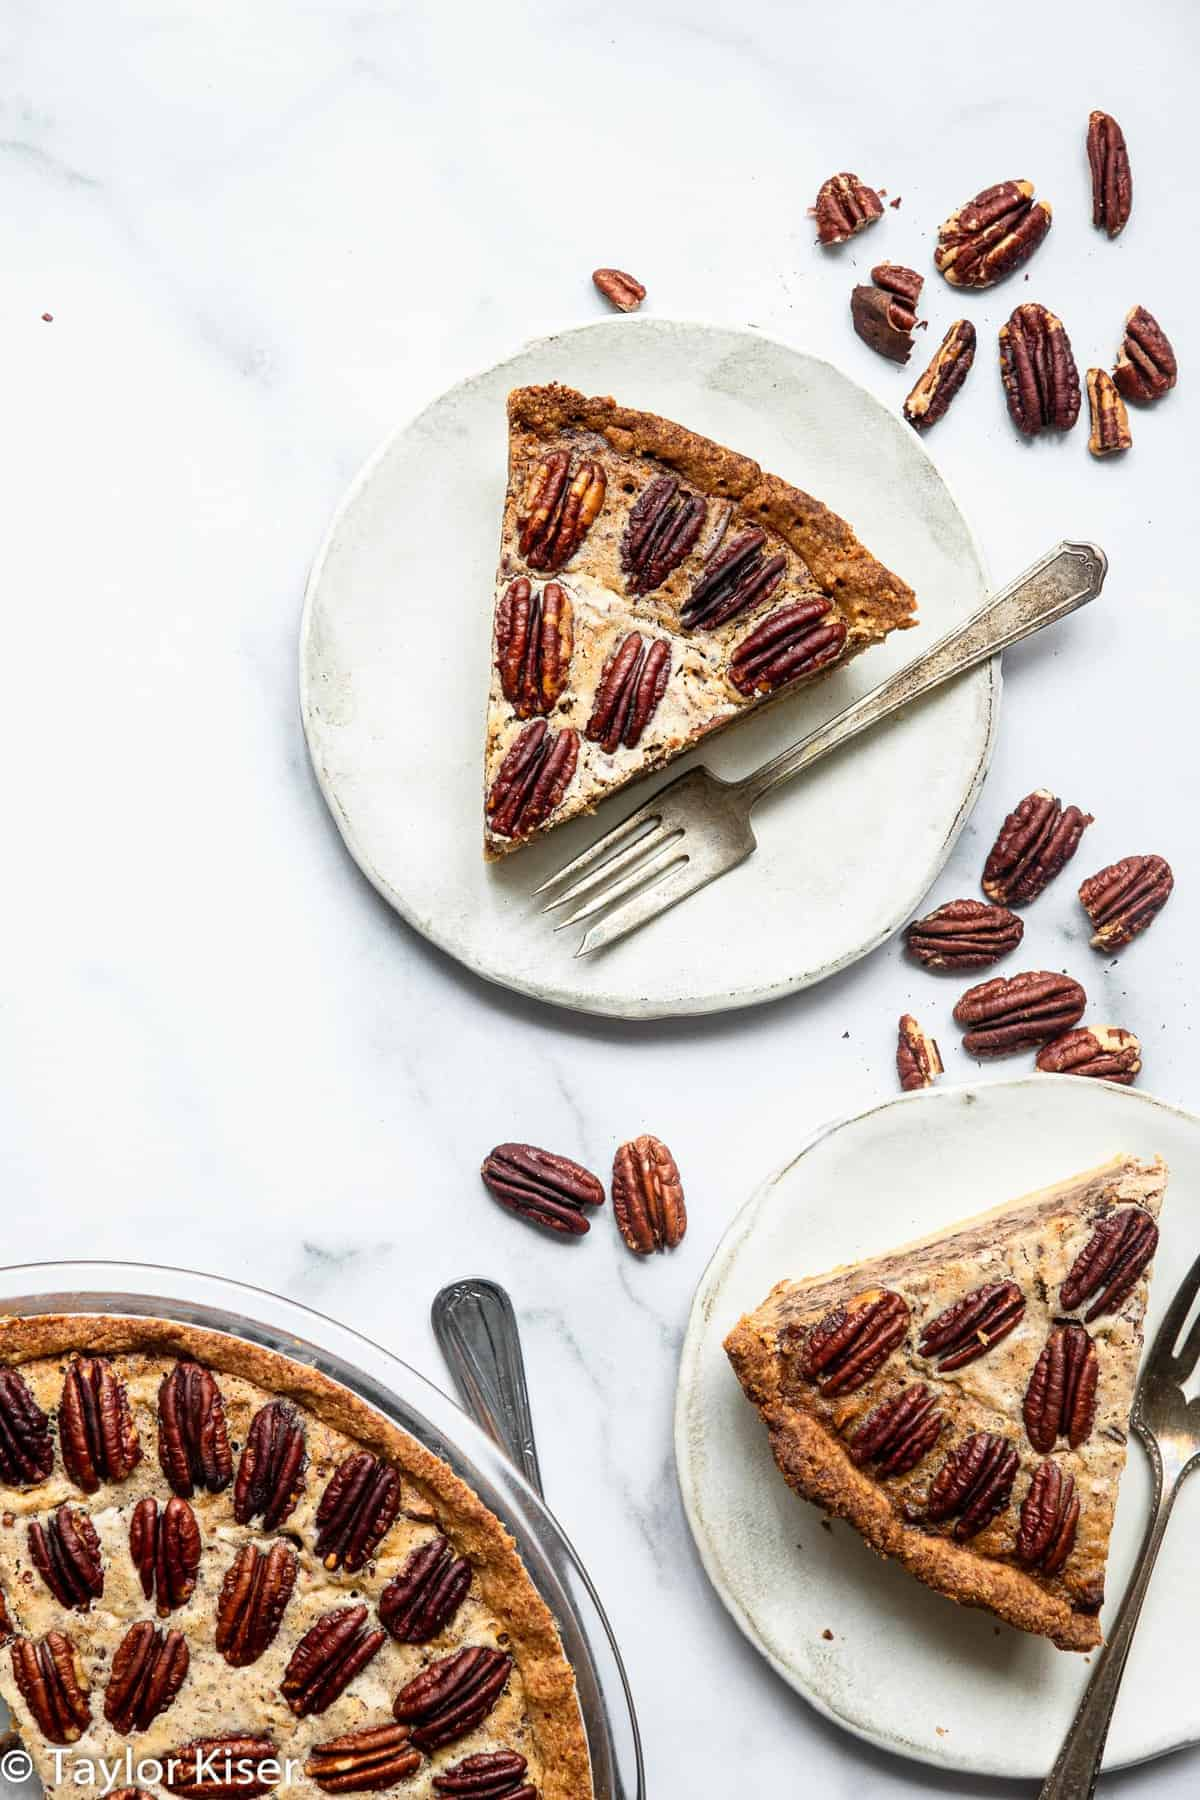 3 slices of sugar free pecan pie on plates